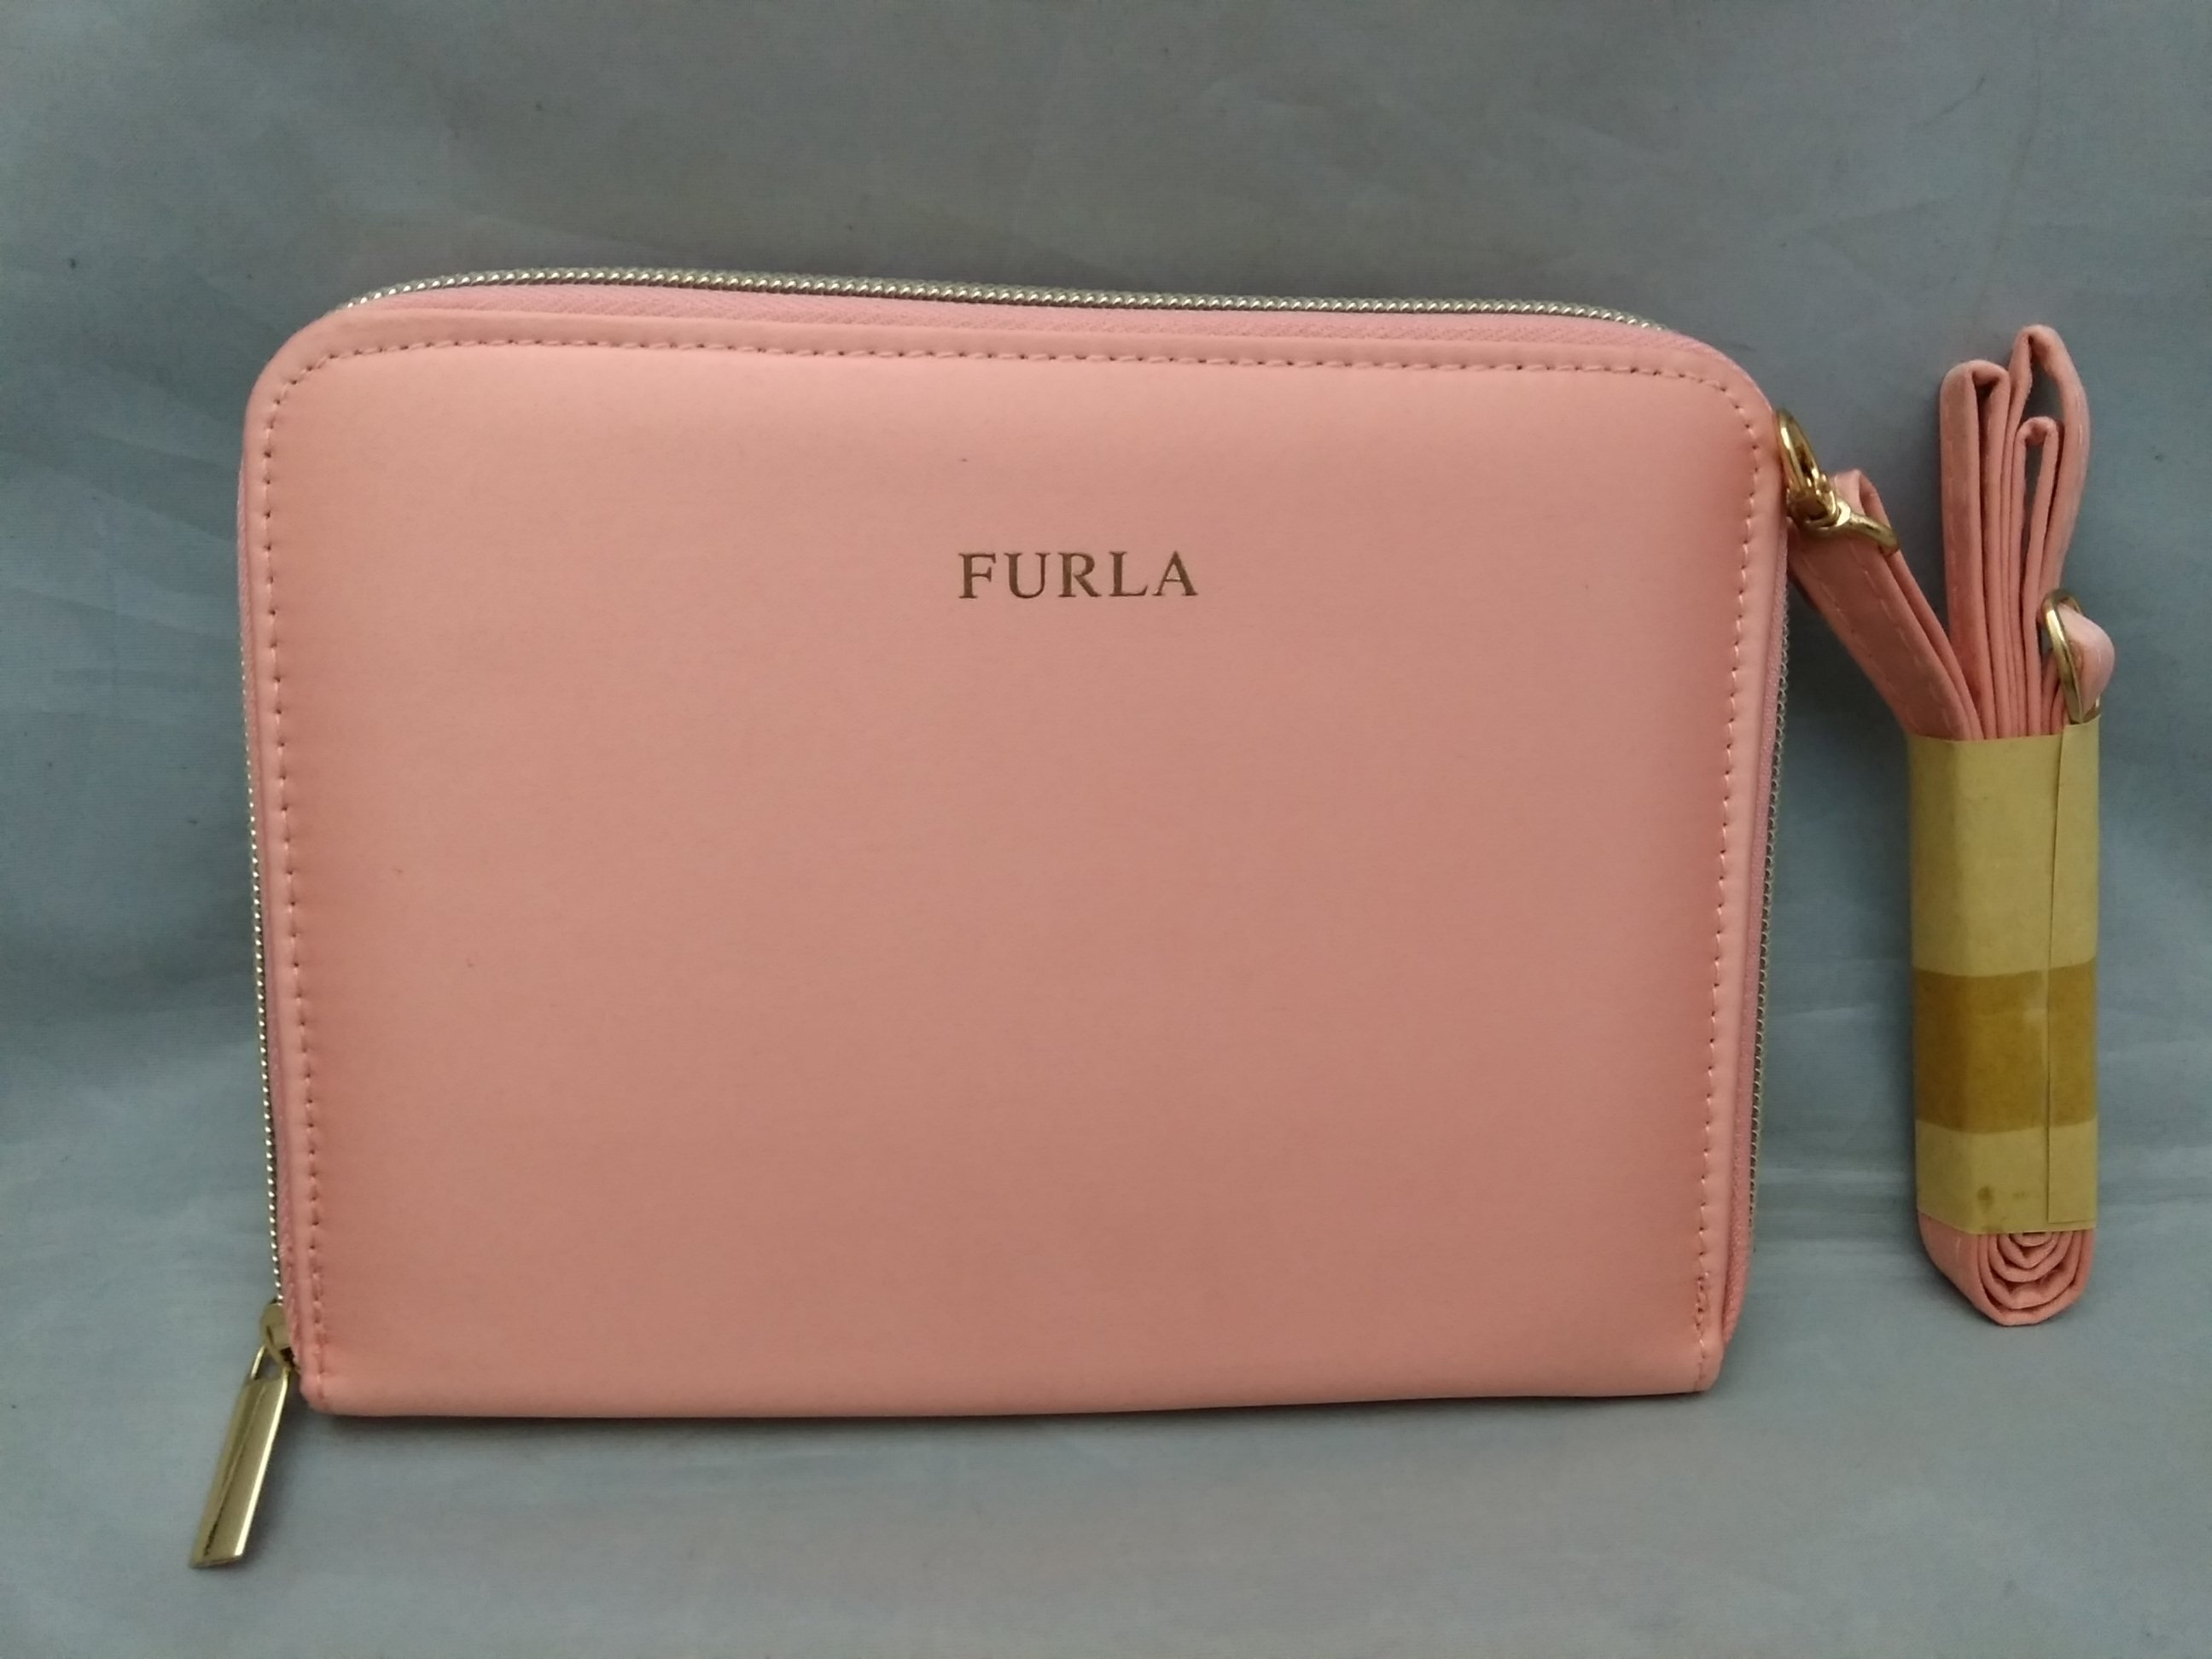 FURLA フルラ マルチケース ミニ ショルダーバッグ ピンク u1050c